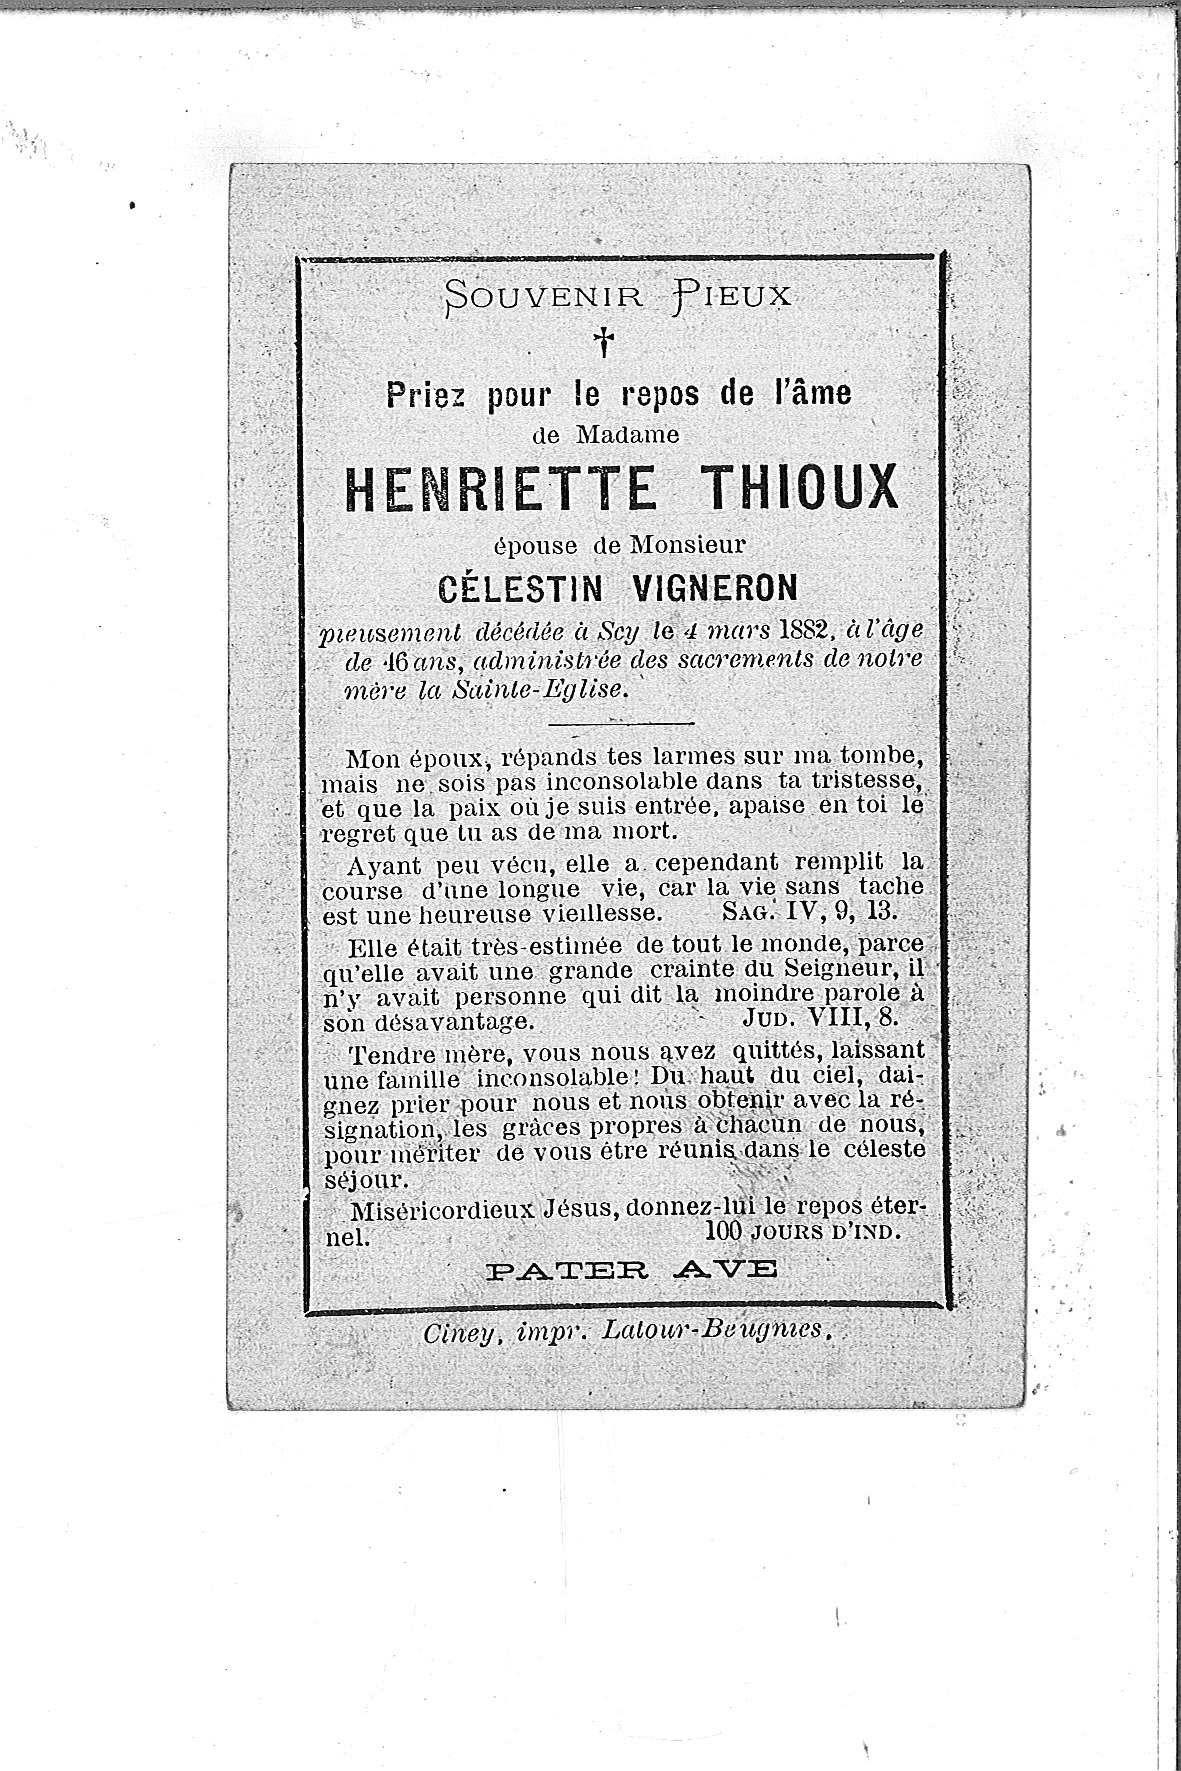 Henriette(1882)20140825083222_00143.jpg